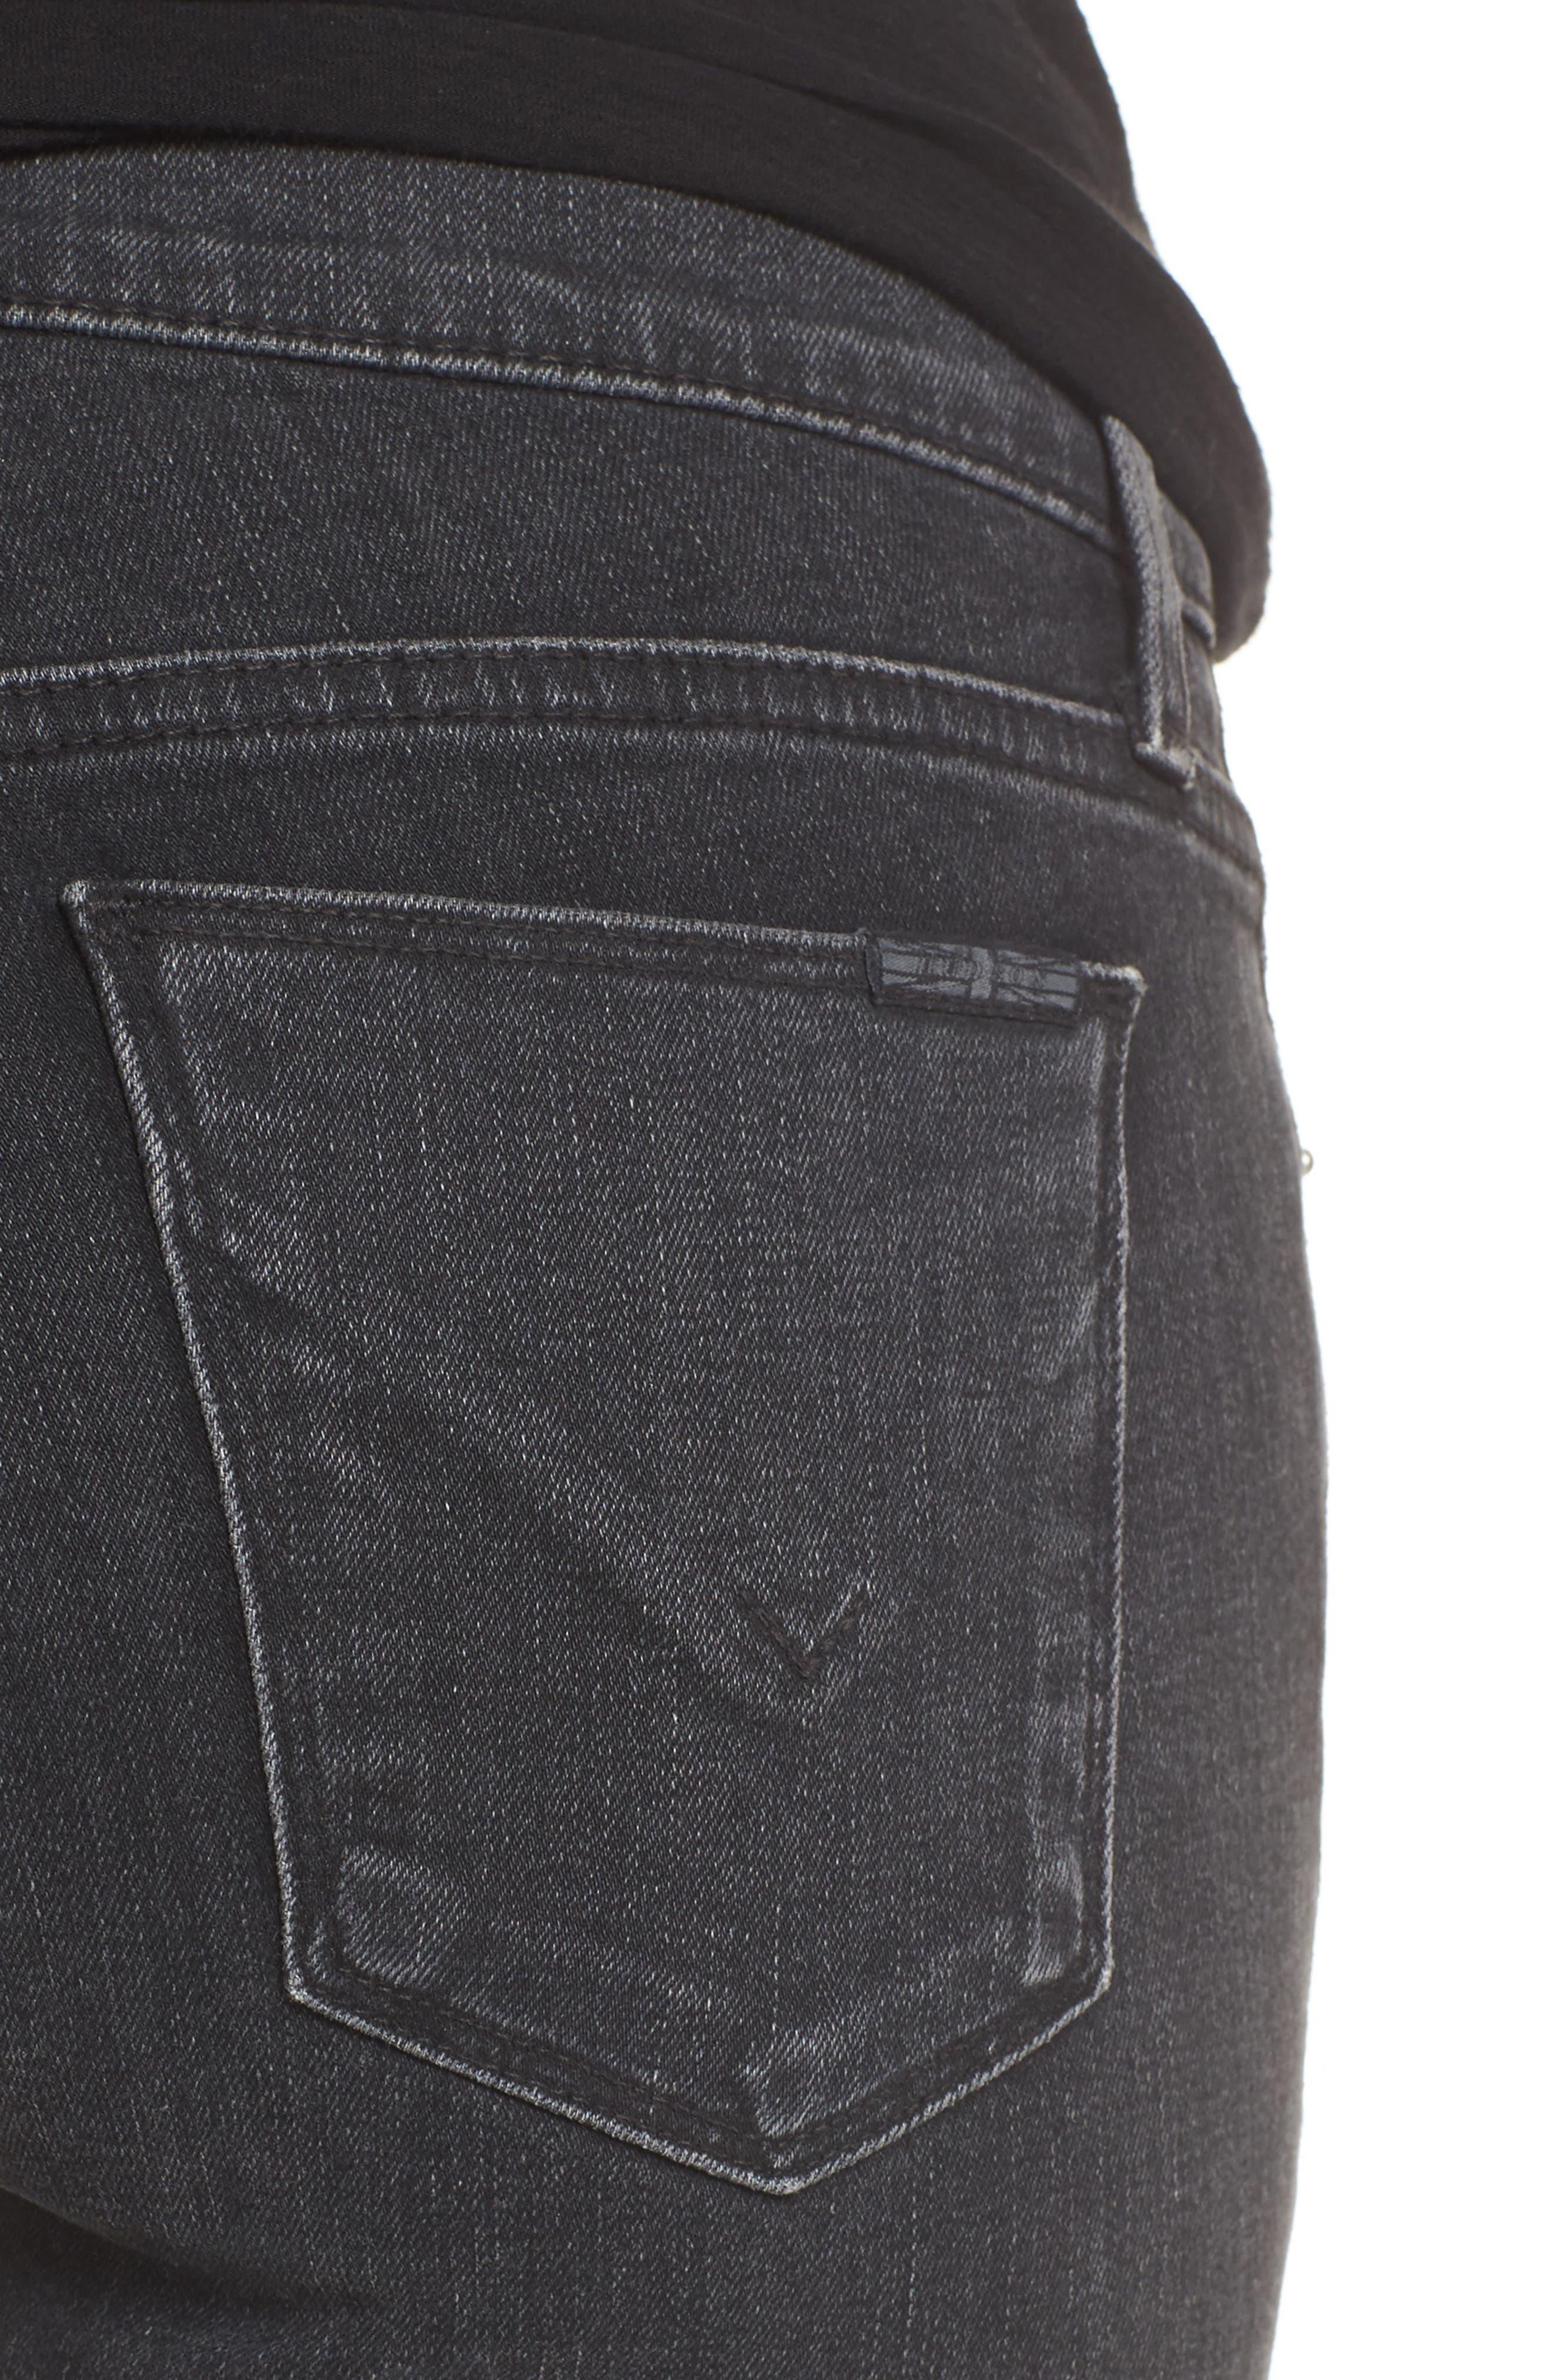 Krista Super Skinny Jeans,                             Alternate thumbnail 4, color,                             8Bit